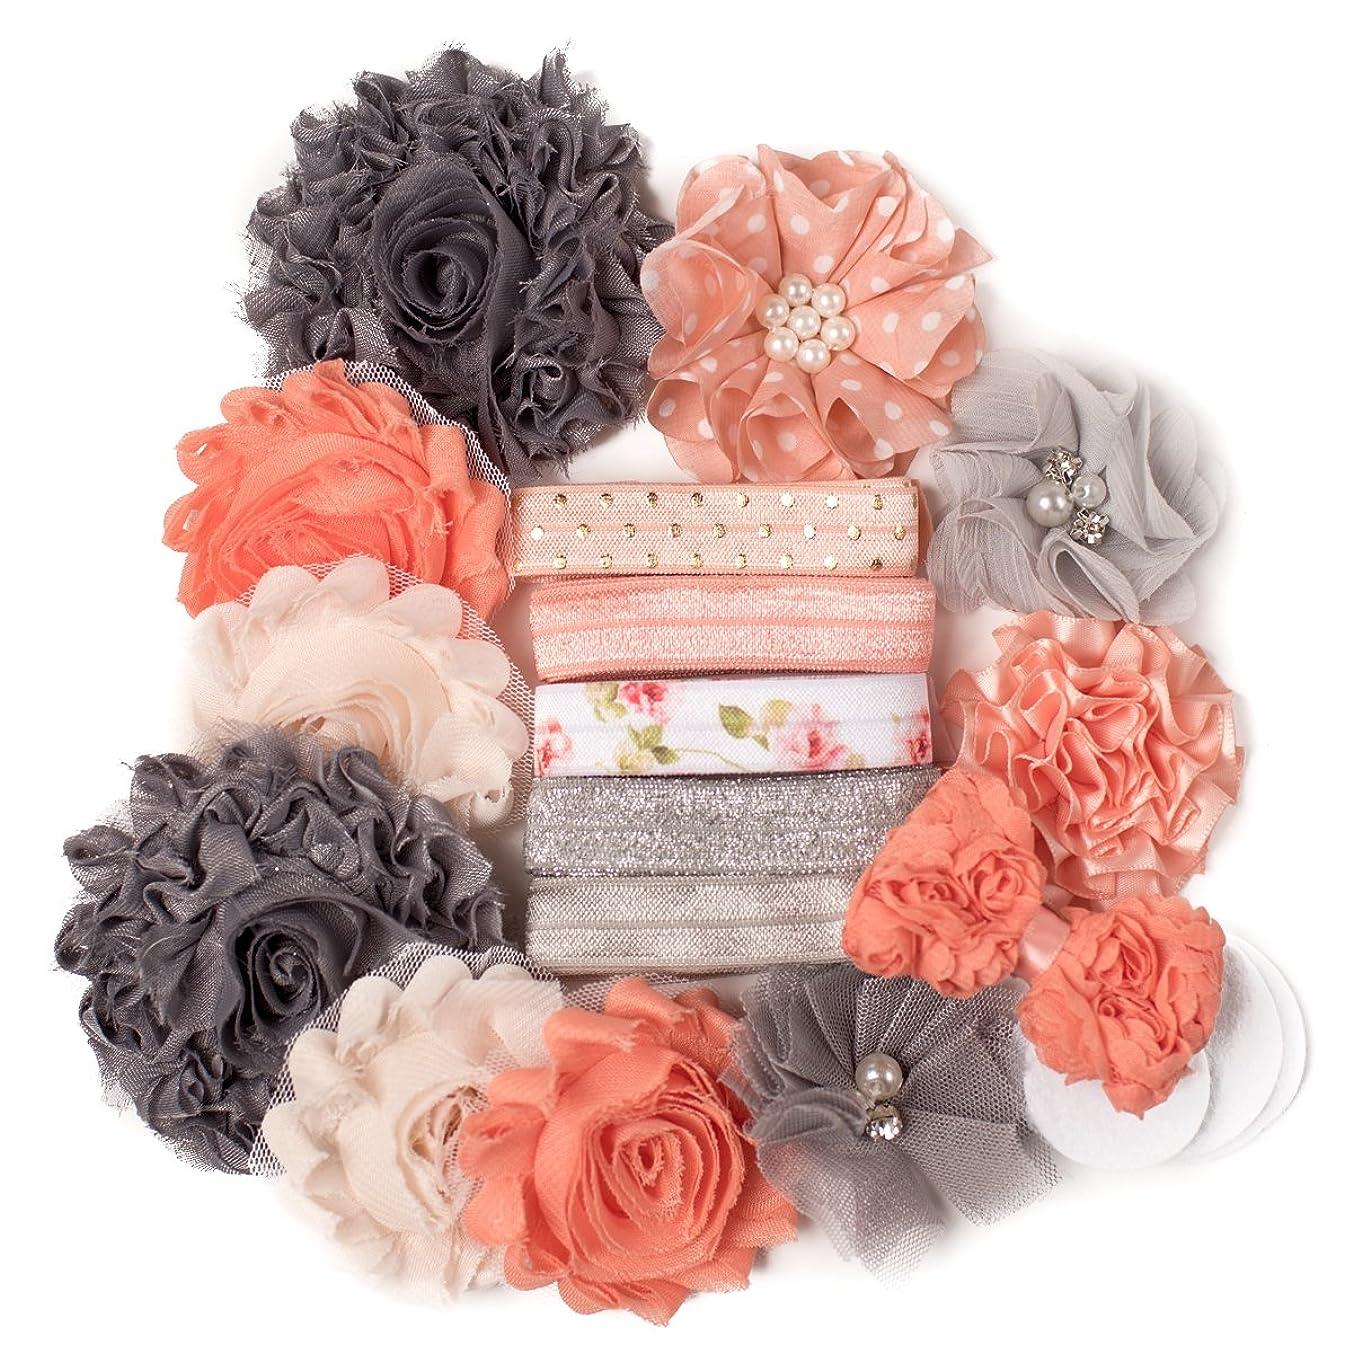 Peachy Keen : Peach & Silver Gray DIY Deluxe Mini Headband Kit Makes 5-10 Headband Hair Accessories : Shabby Chiffon Craft Roses FOE Fold Over Elastic : Princess Parties & Baby Showers